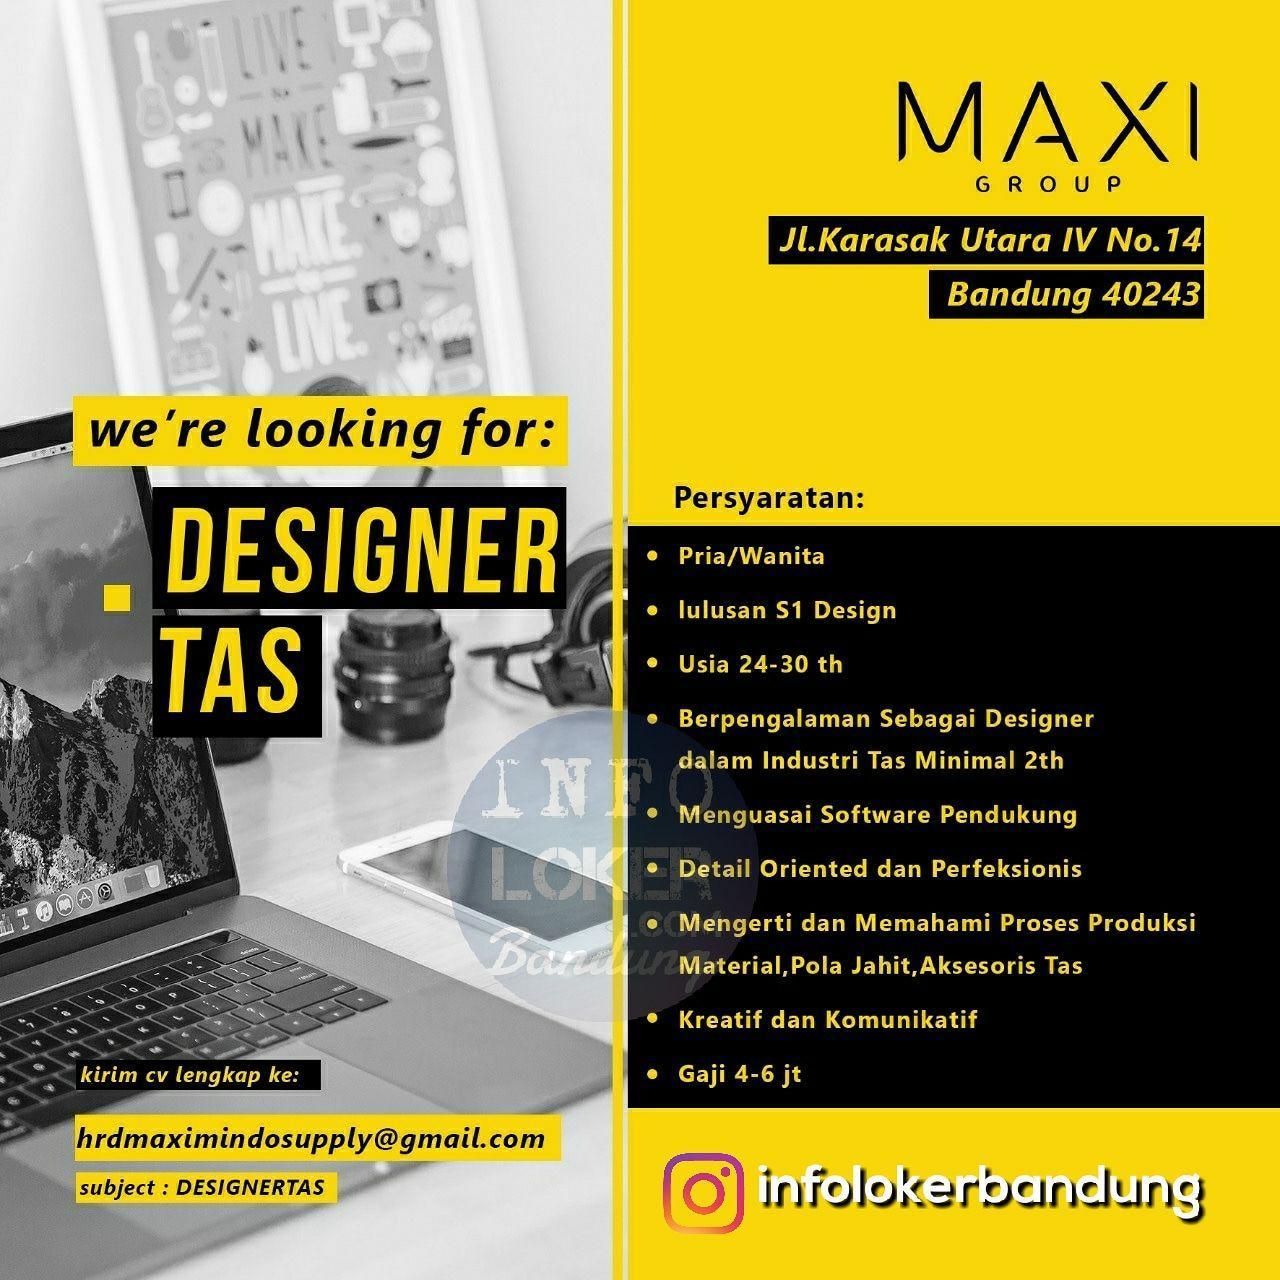 Lowongan Kerja Designer Tas Maxi Group Bandung September 2018